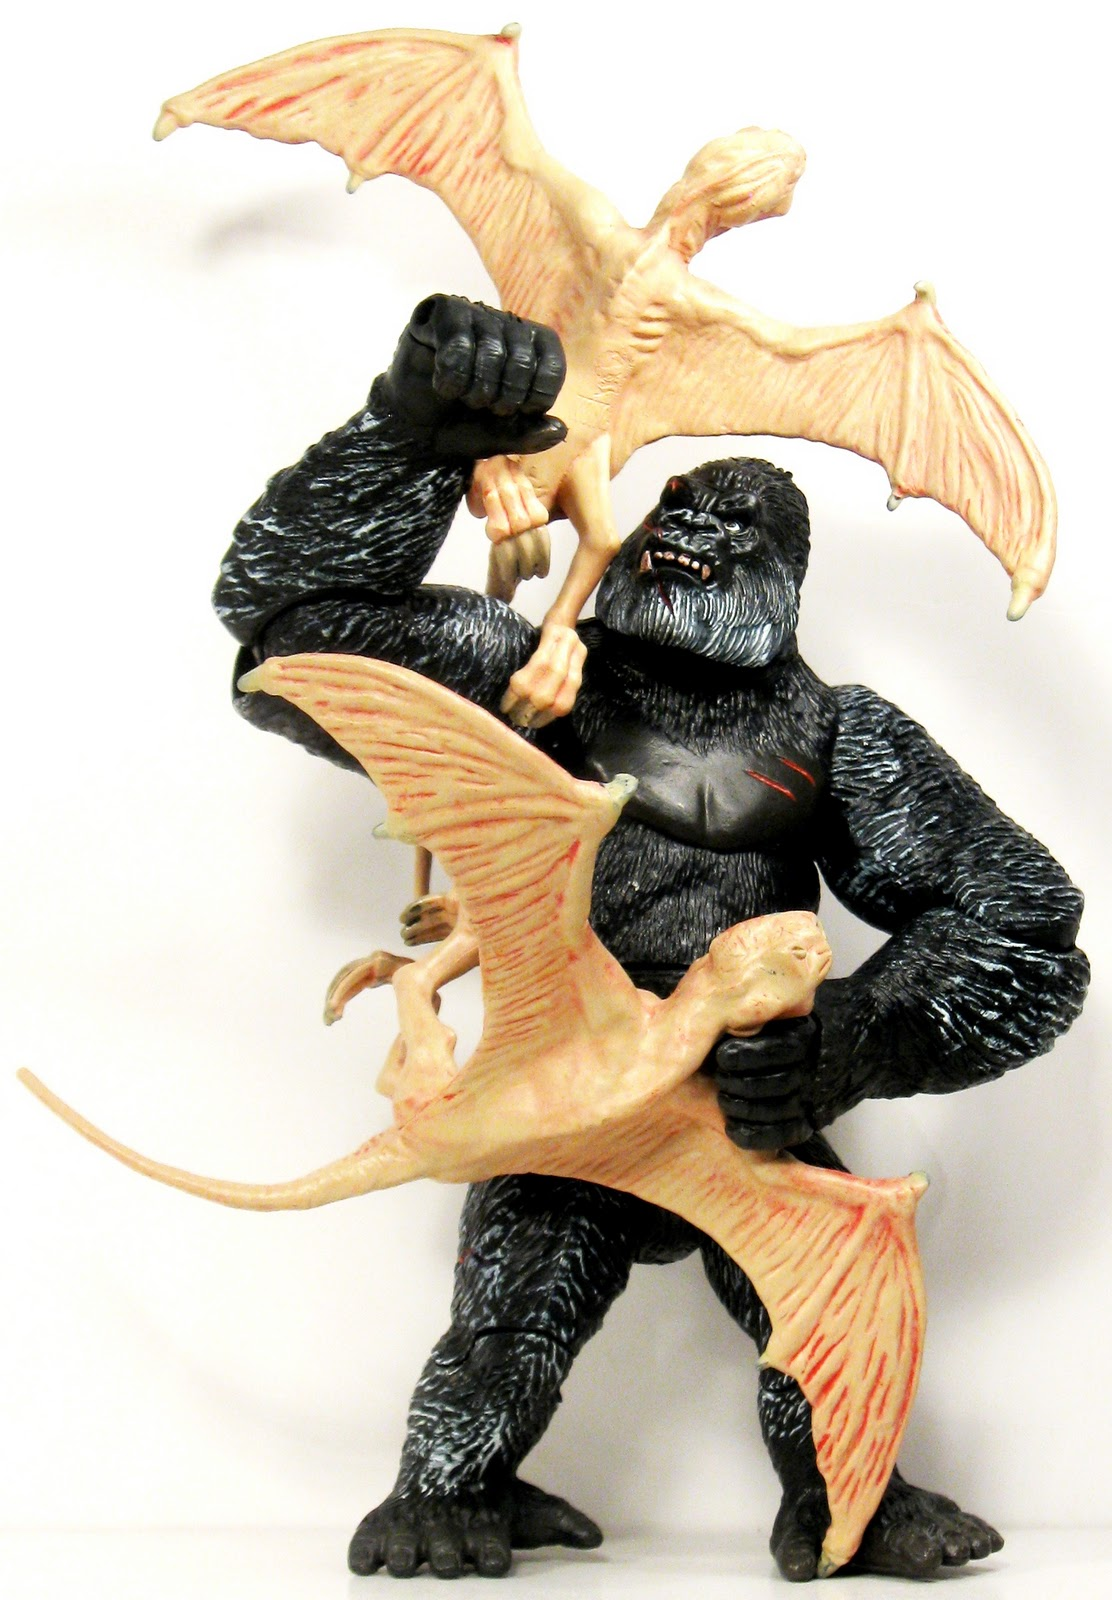 Download Toys and Stuff: Playmates - #66004 Kong vs Terapusmordax